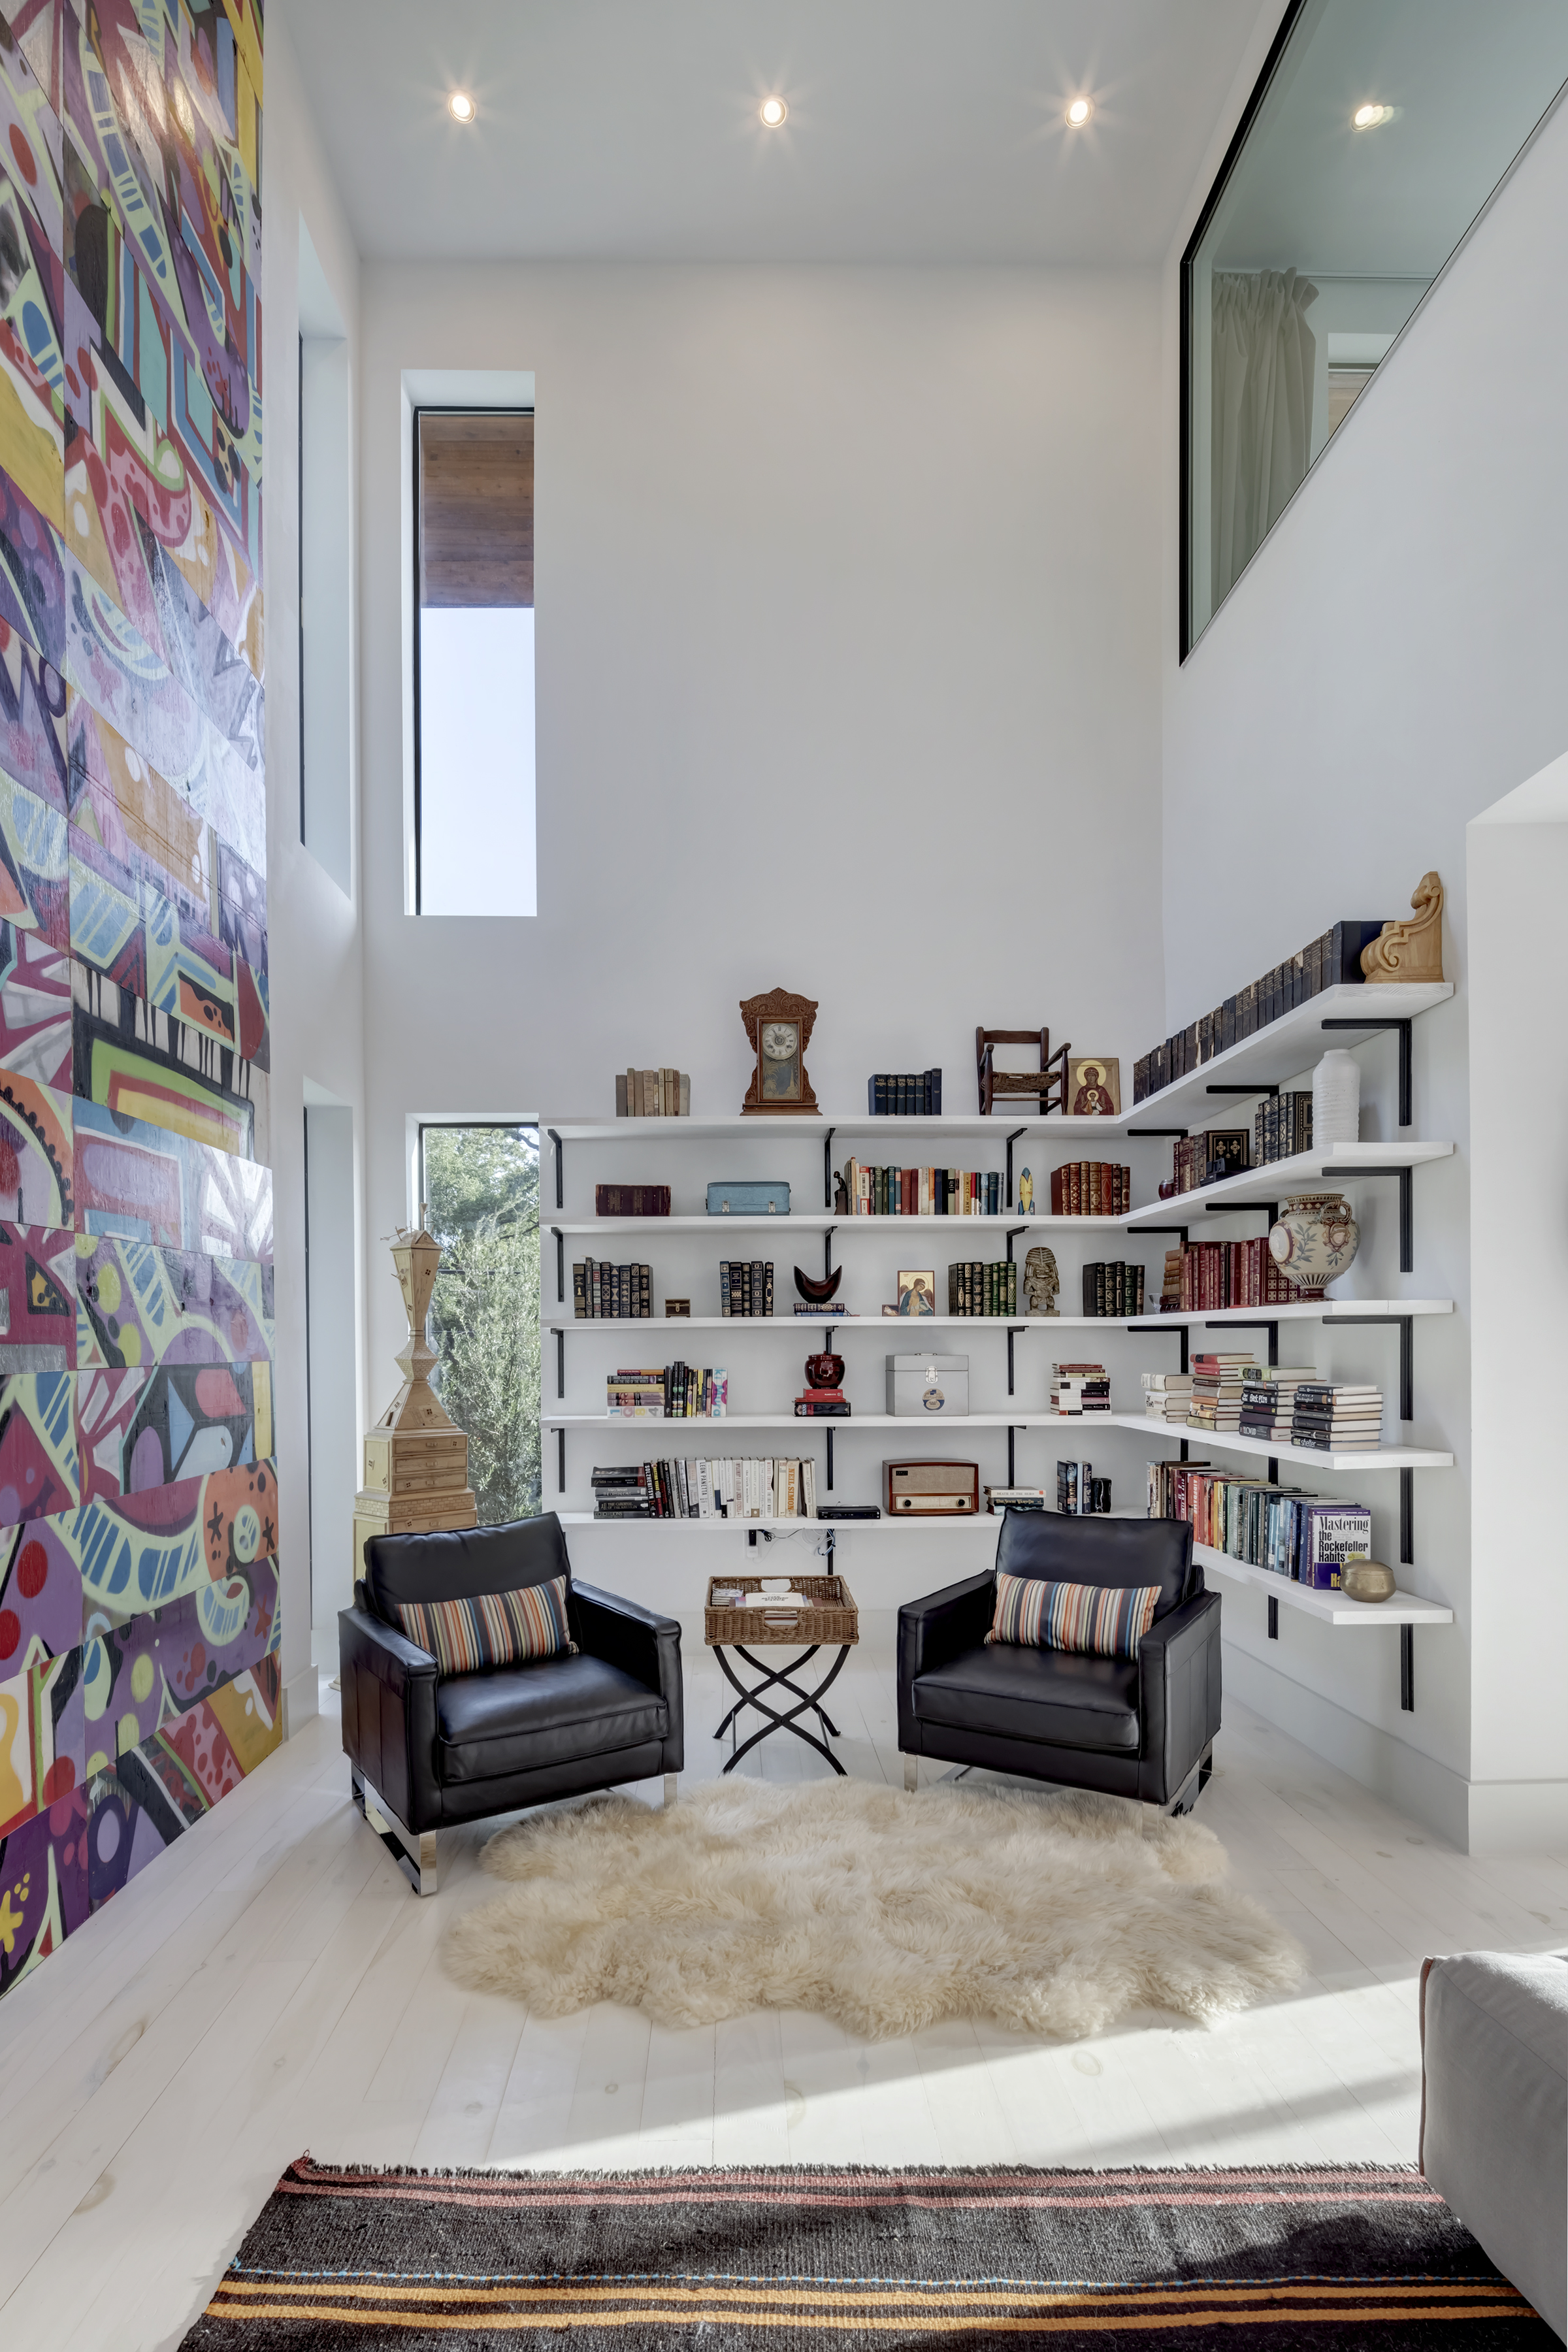 14 Mullet House by Matt Fajkus Architecture. Photo by Charles Davis Smith.jpg